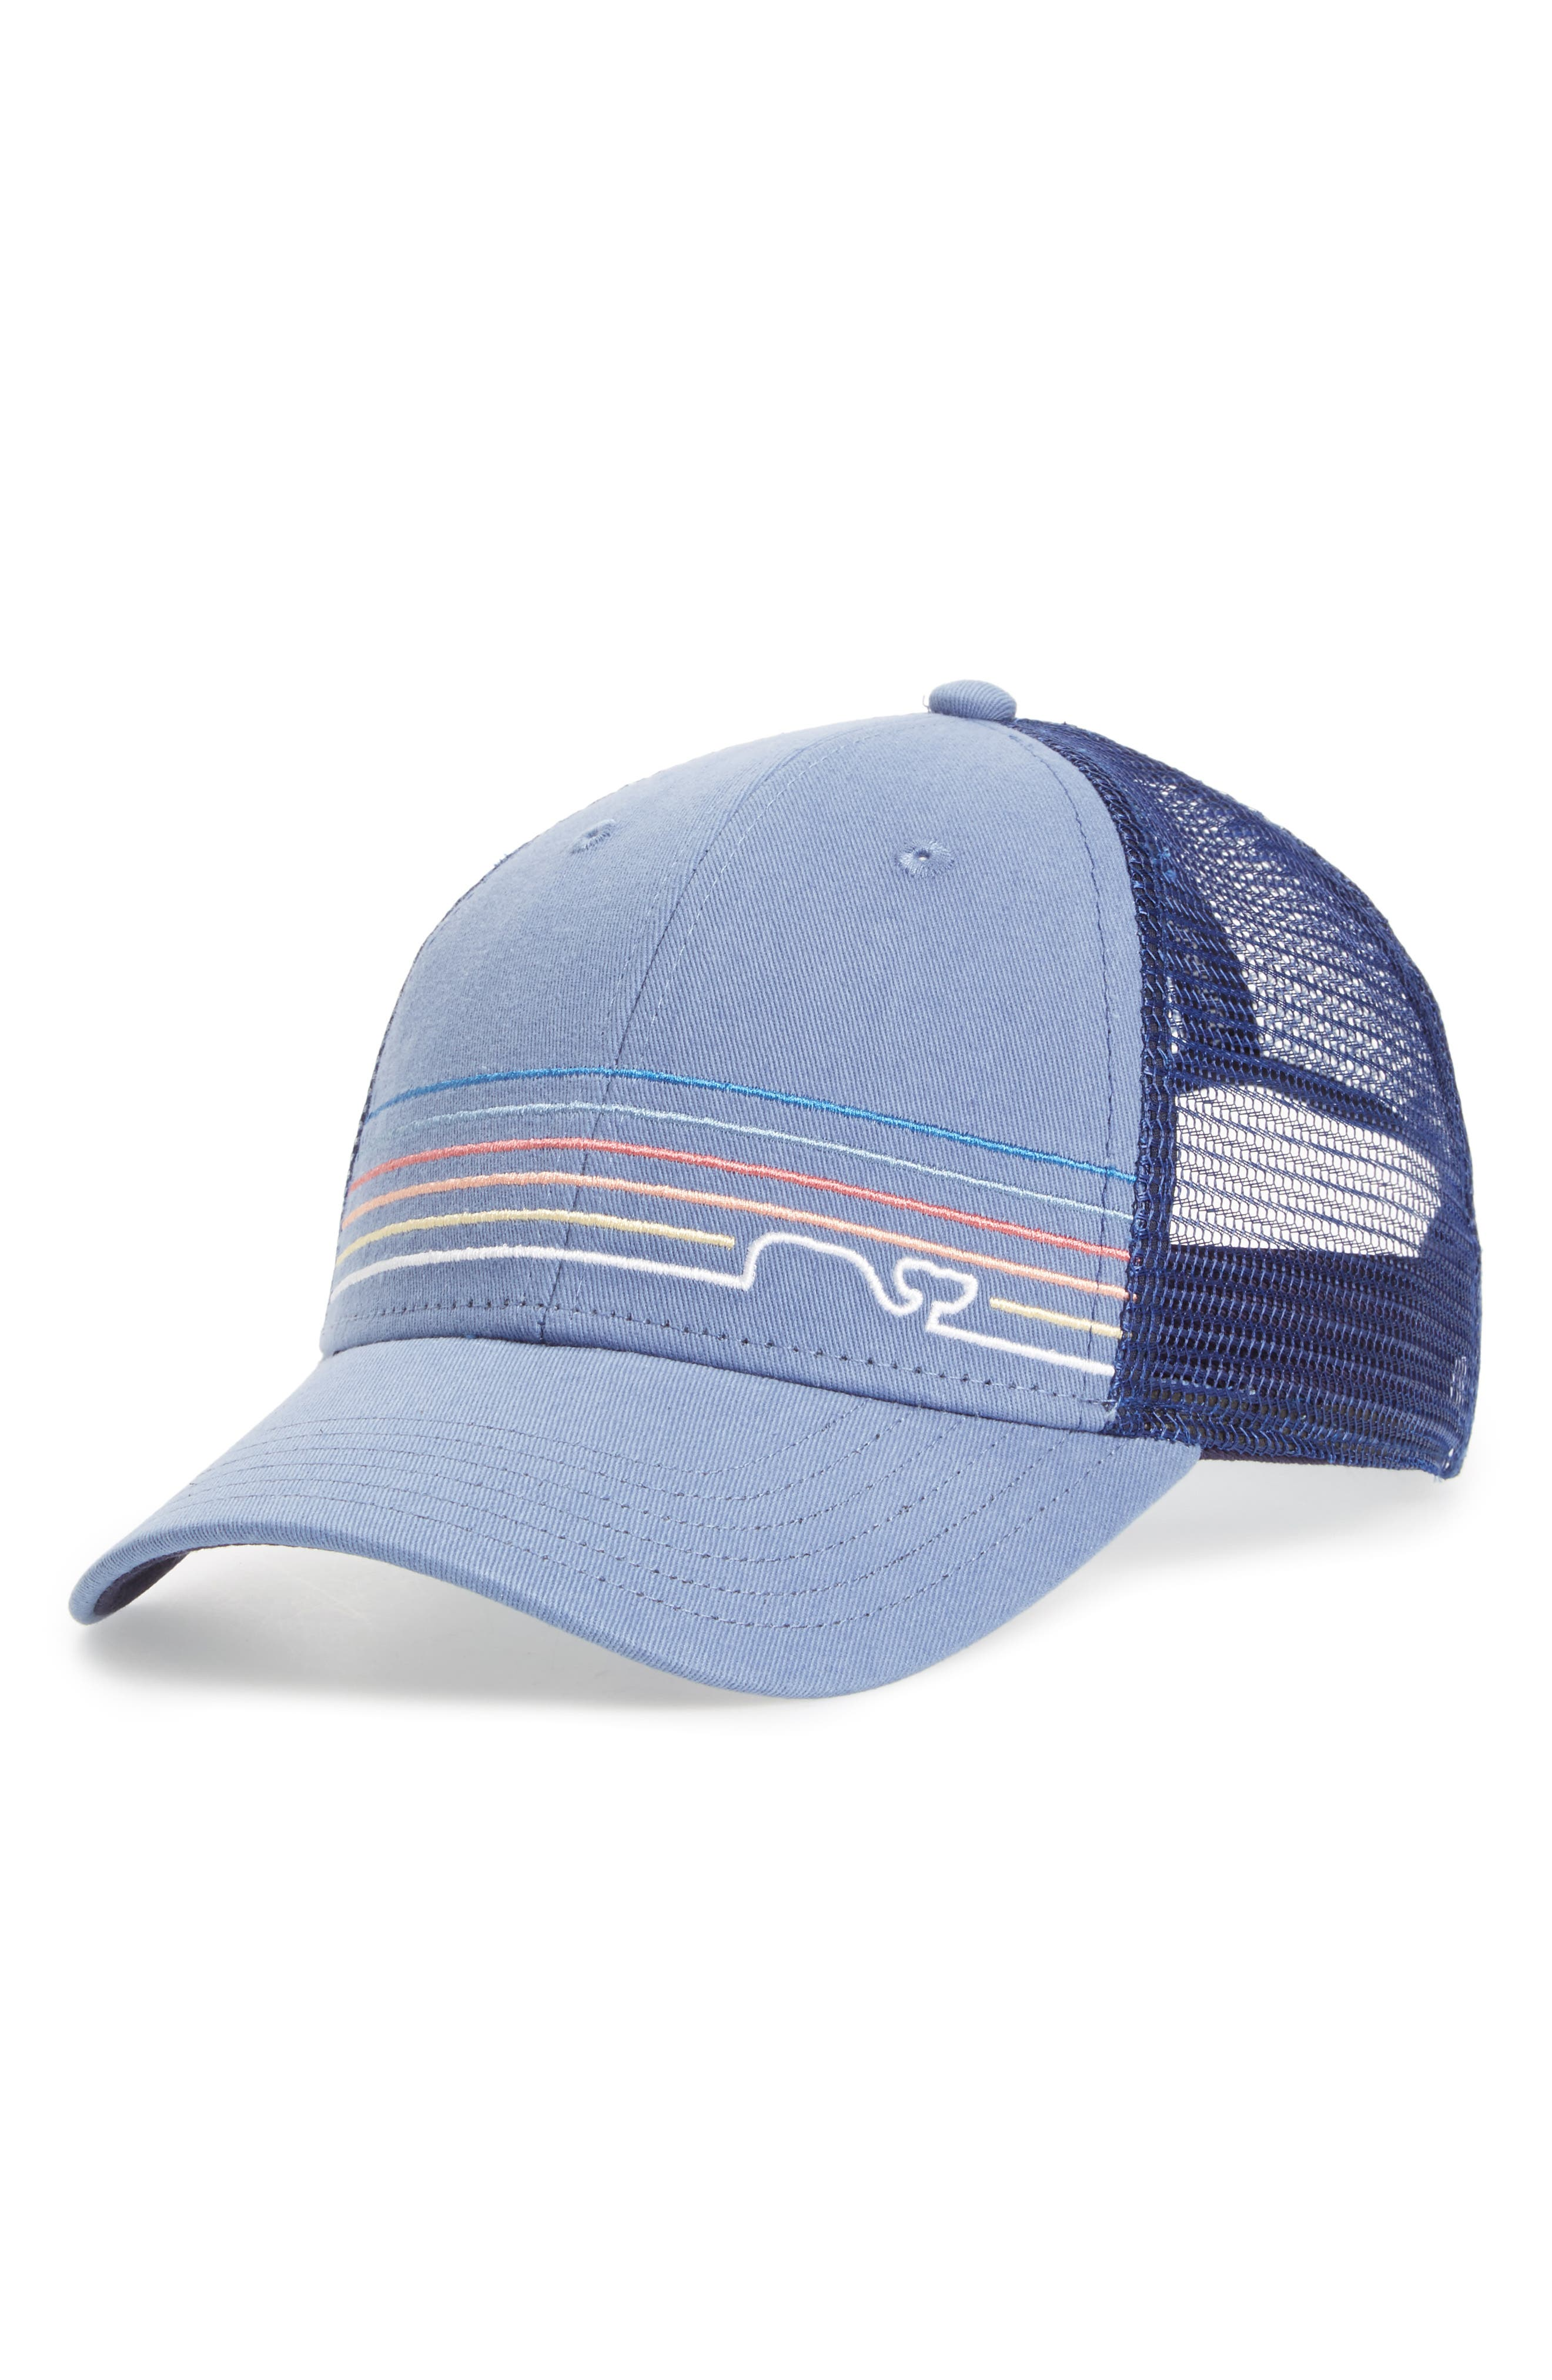 Whaleine Trucker Cap,                         Main,                         color, 461